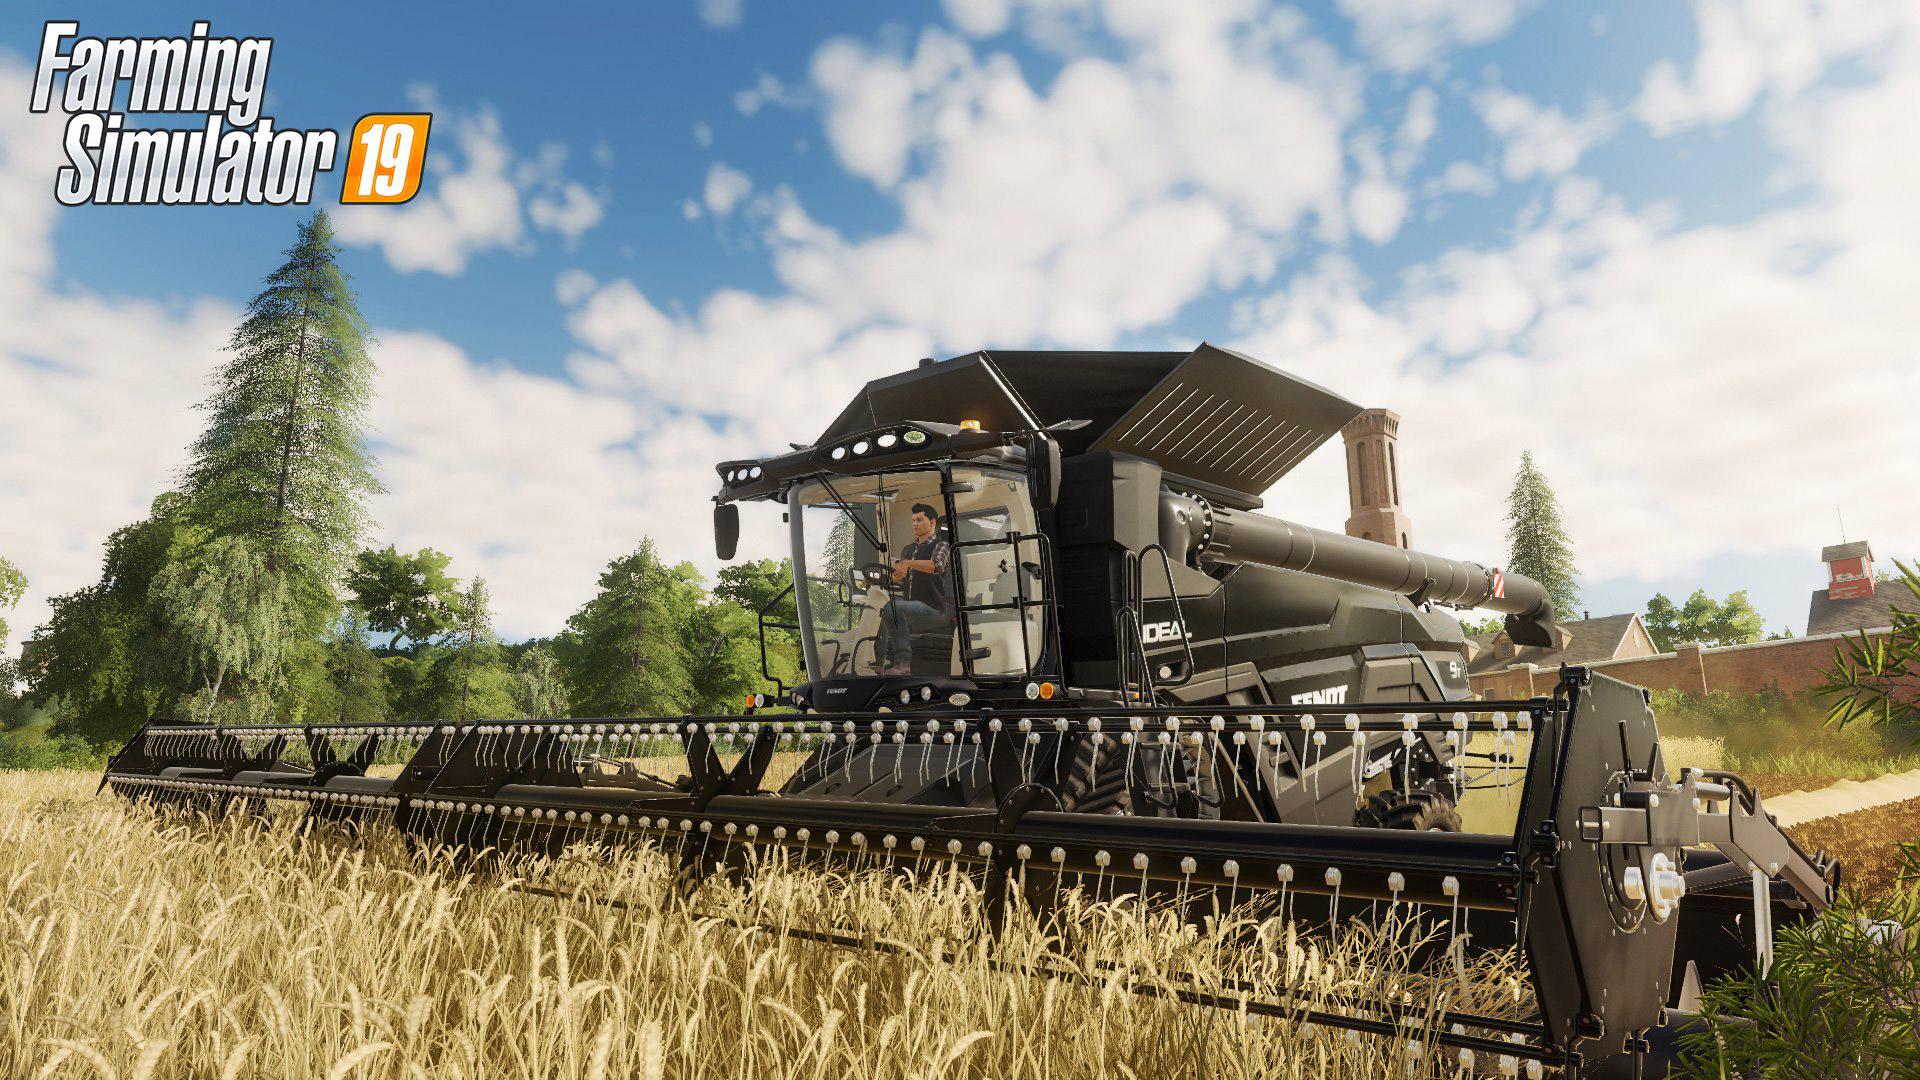 Free Farming Simulator 19 Wallpaper in 1920x1080